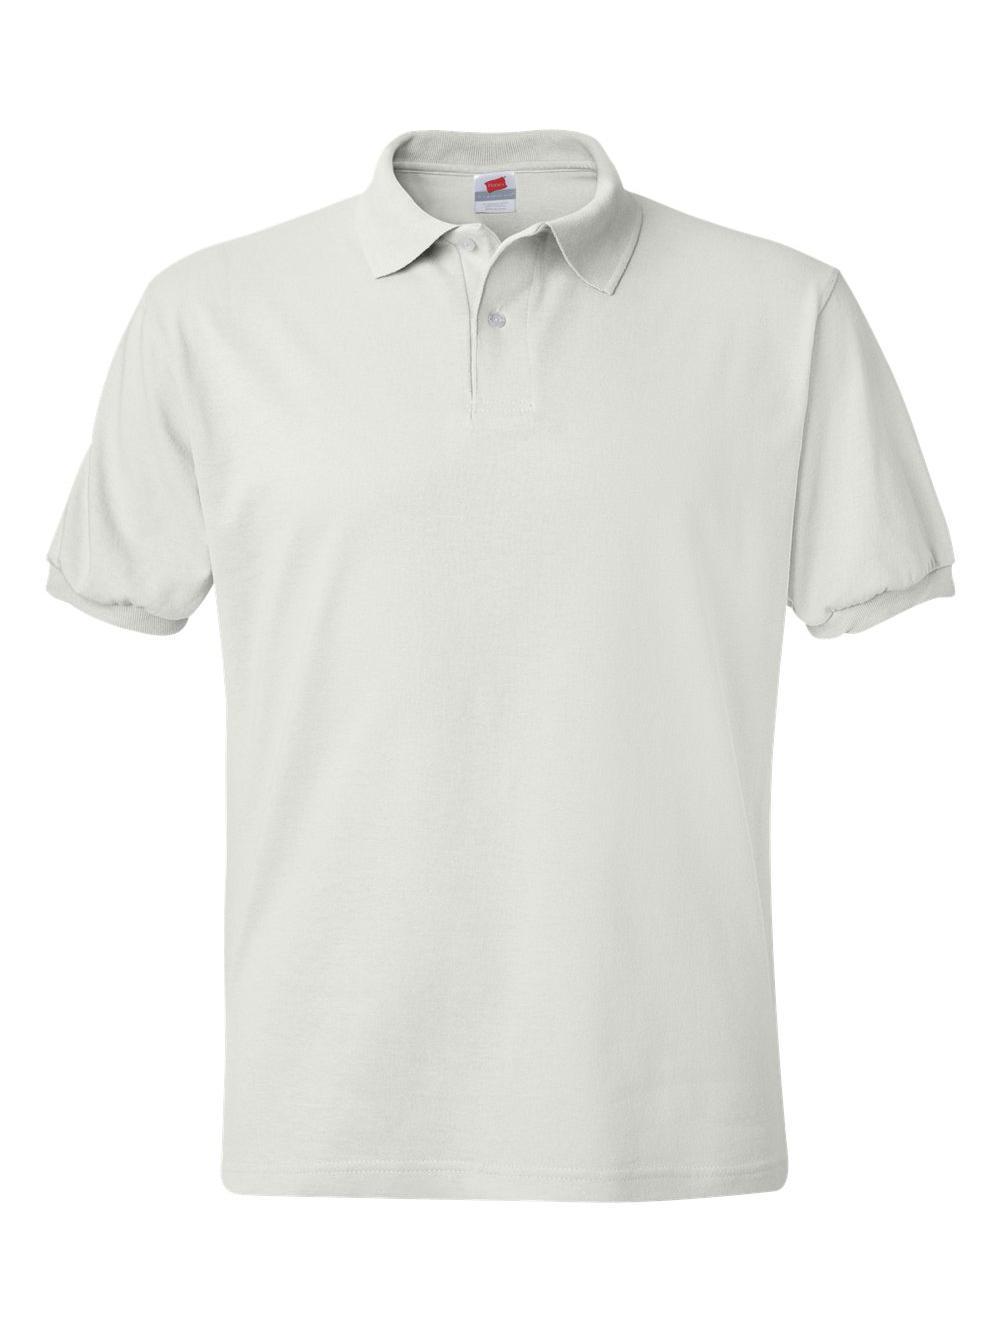 Hanes-Ecosmart-Jersey-Sport-Shirt-054X thumbnail 39